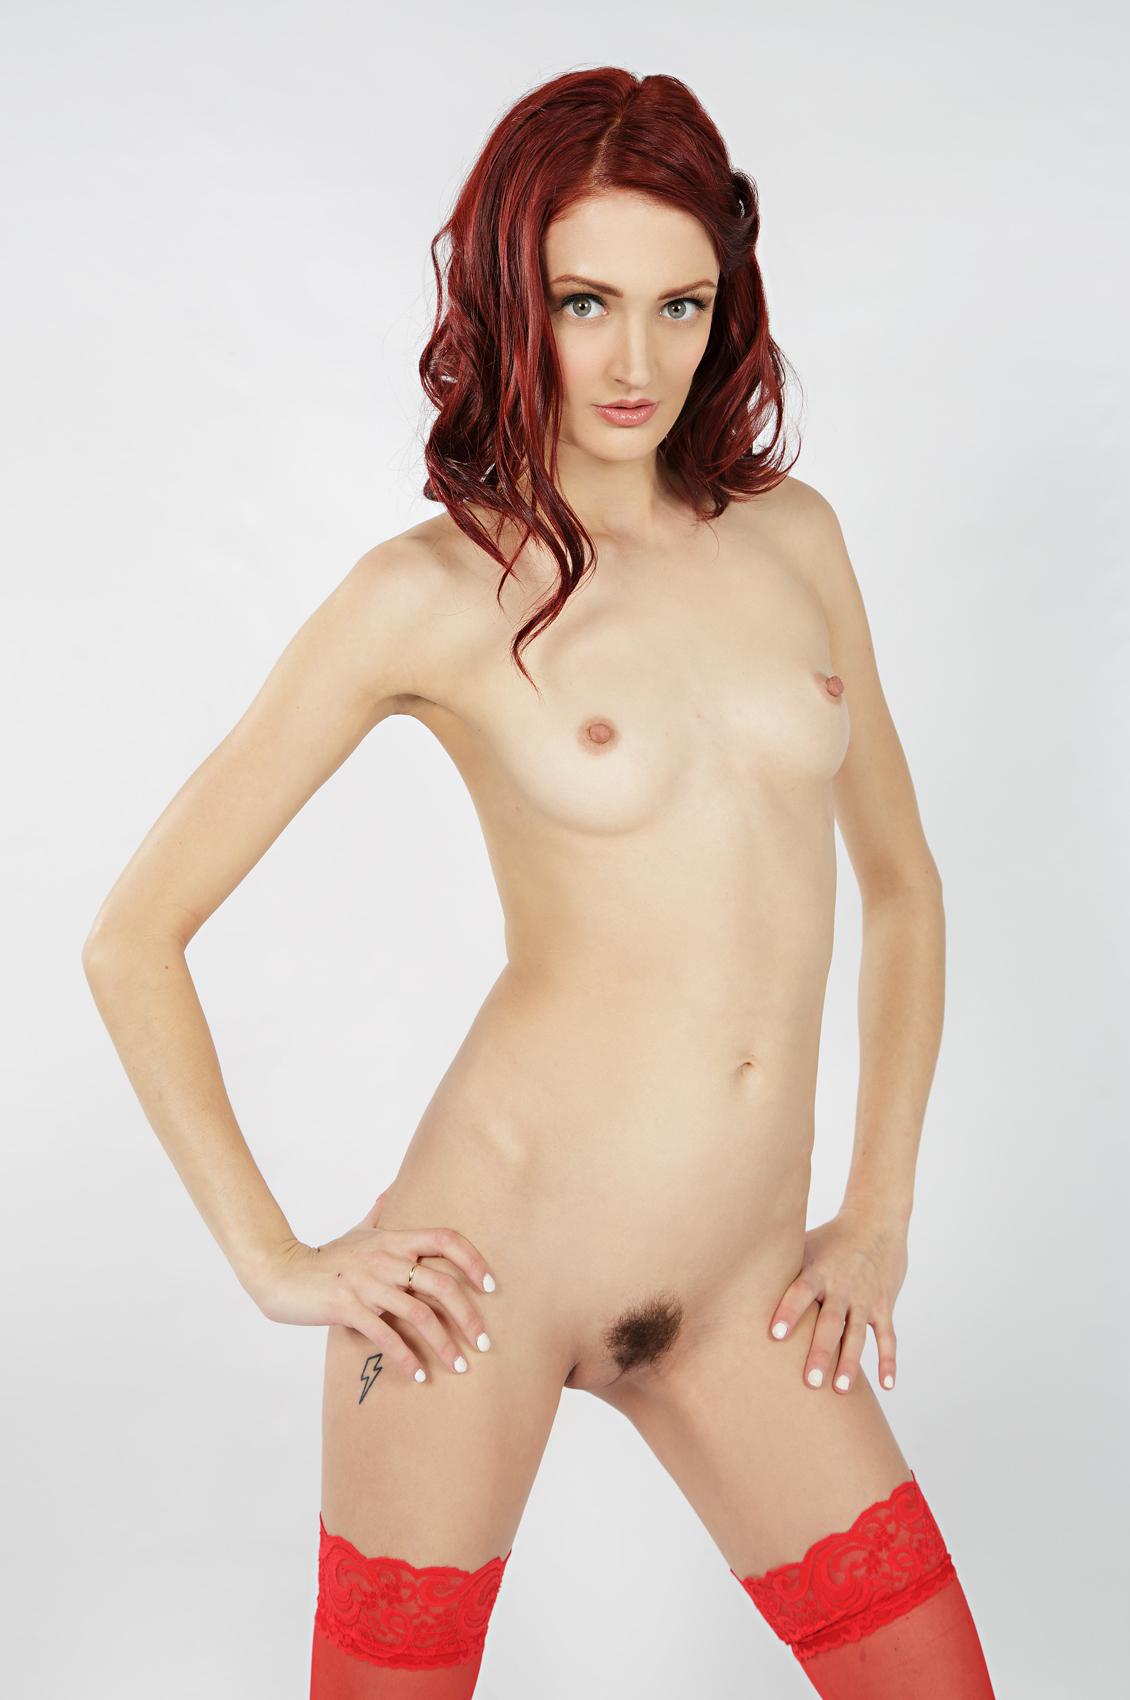 andi rye nude